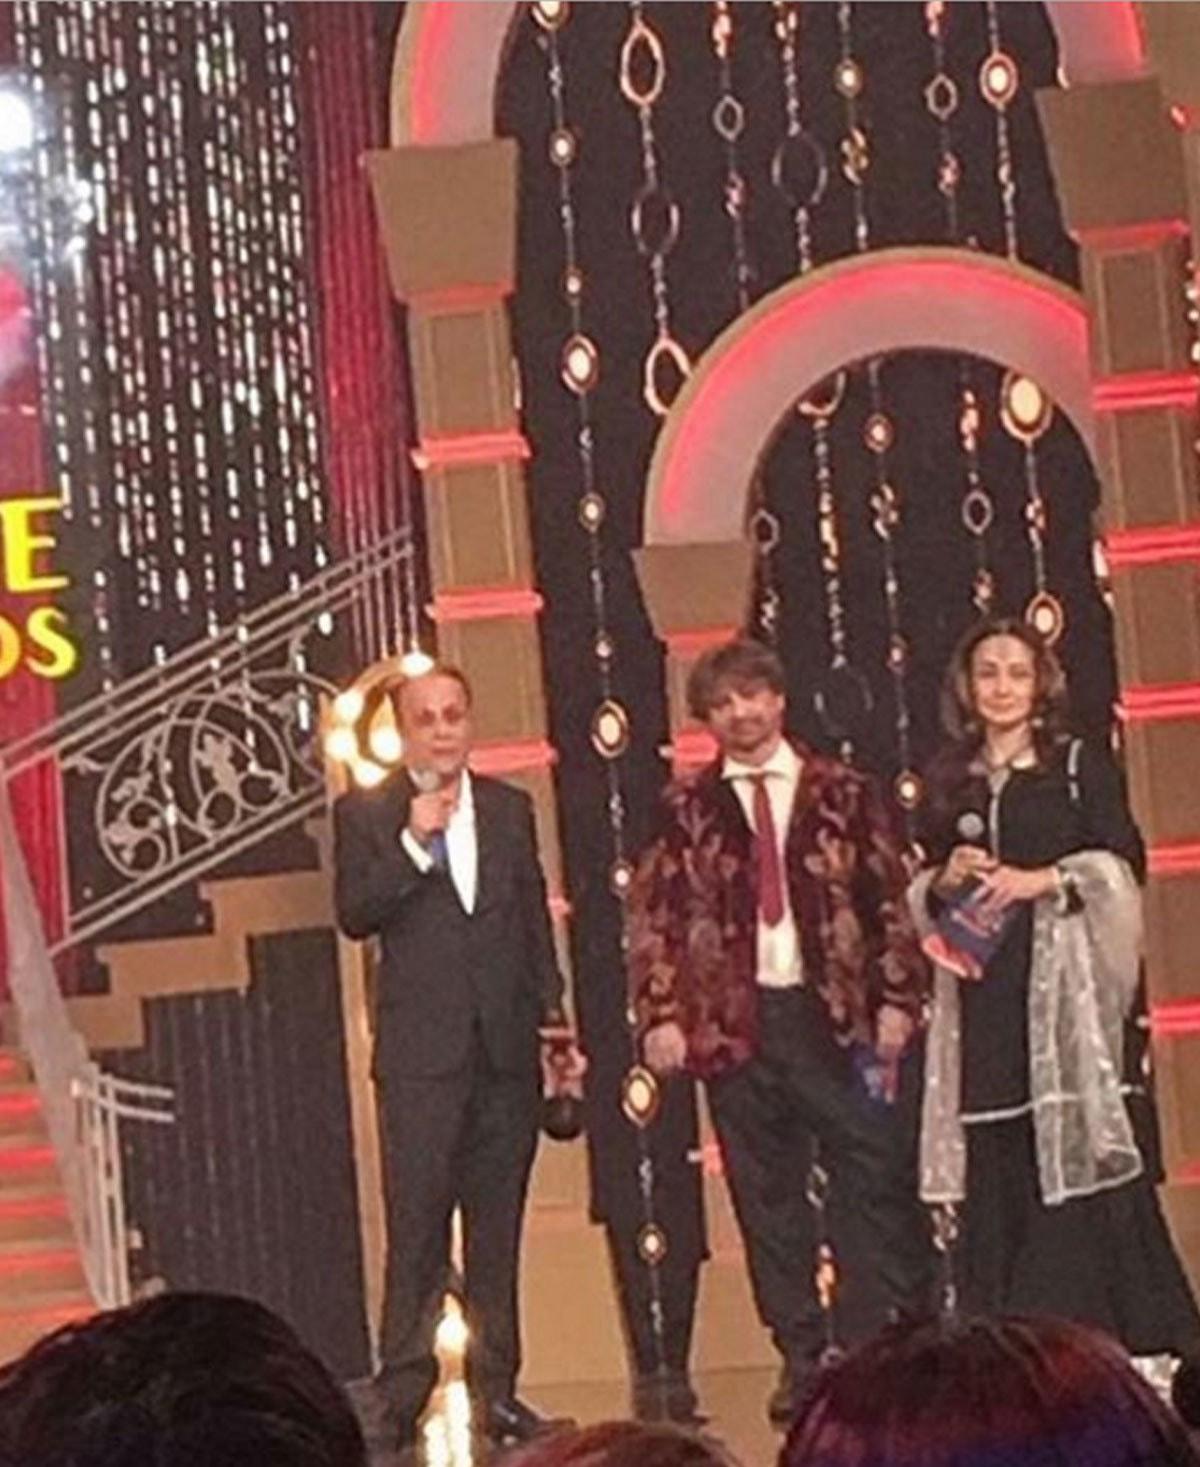 Raheal Rao giving his acceptance speech. Photo: Instagram